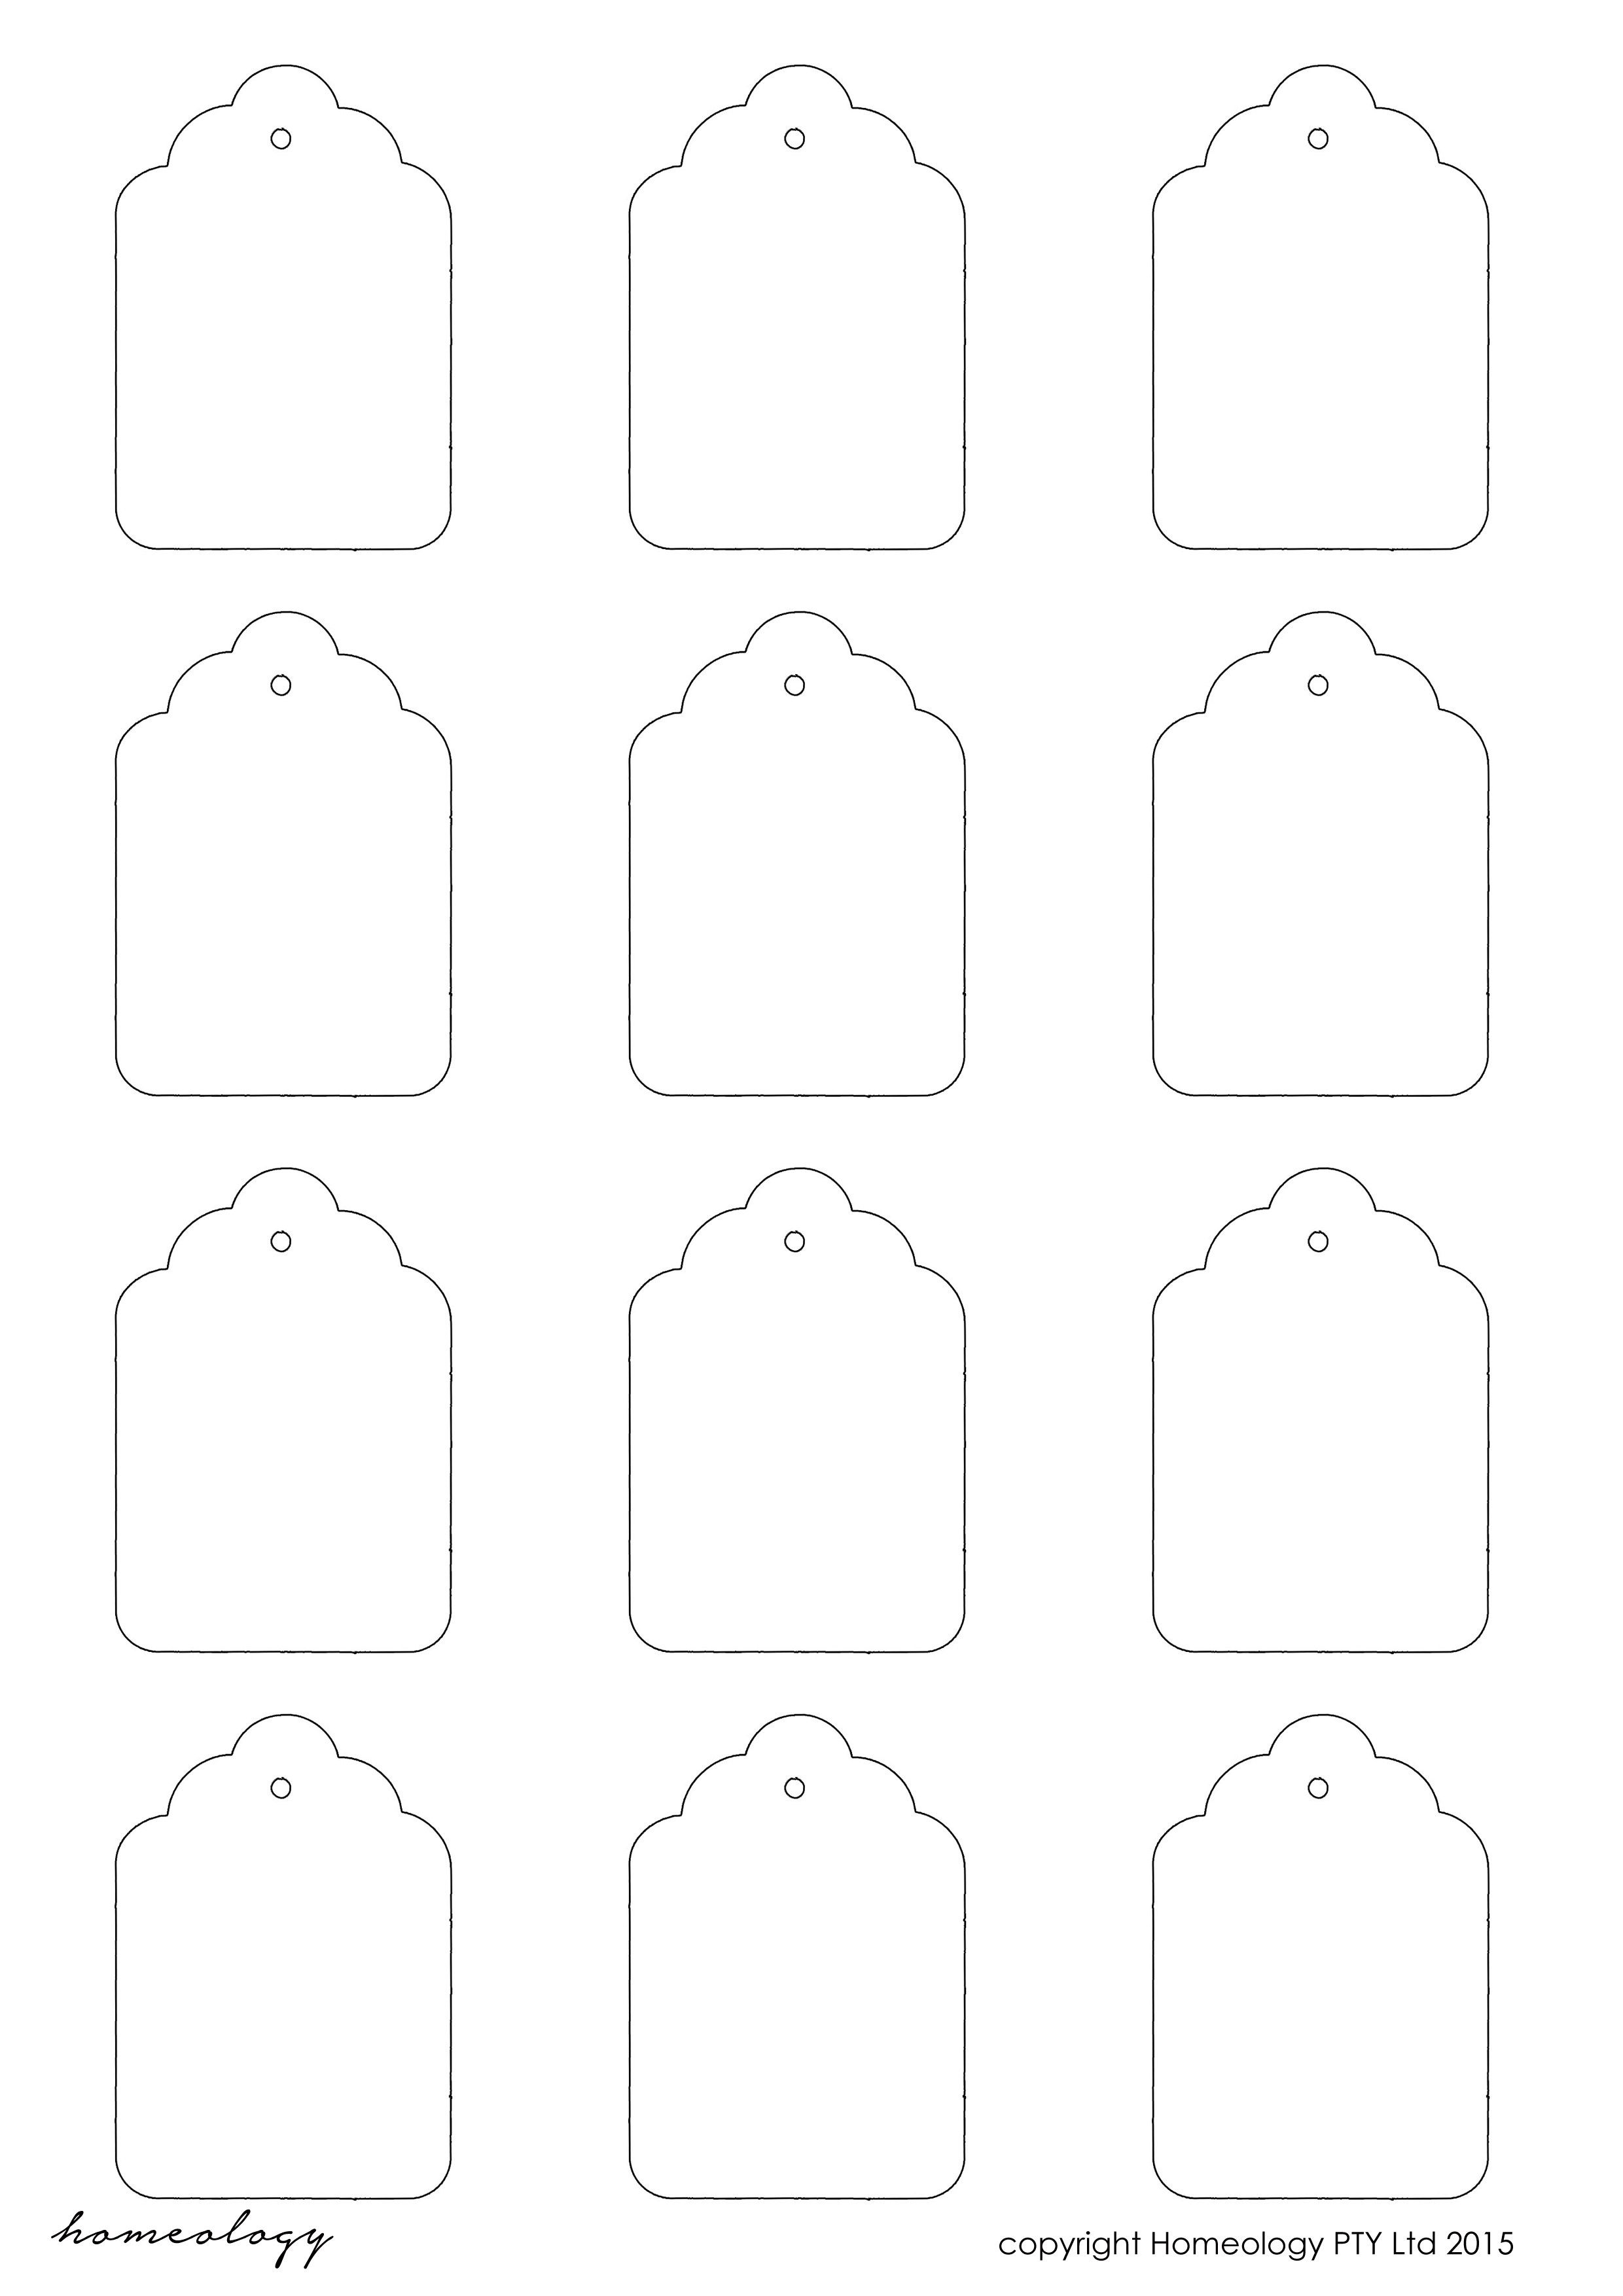 Homeology-Gift-Tag-Template.jpg (2480×3508)